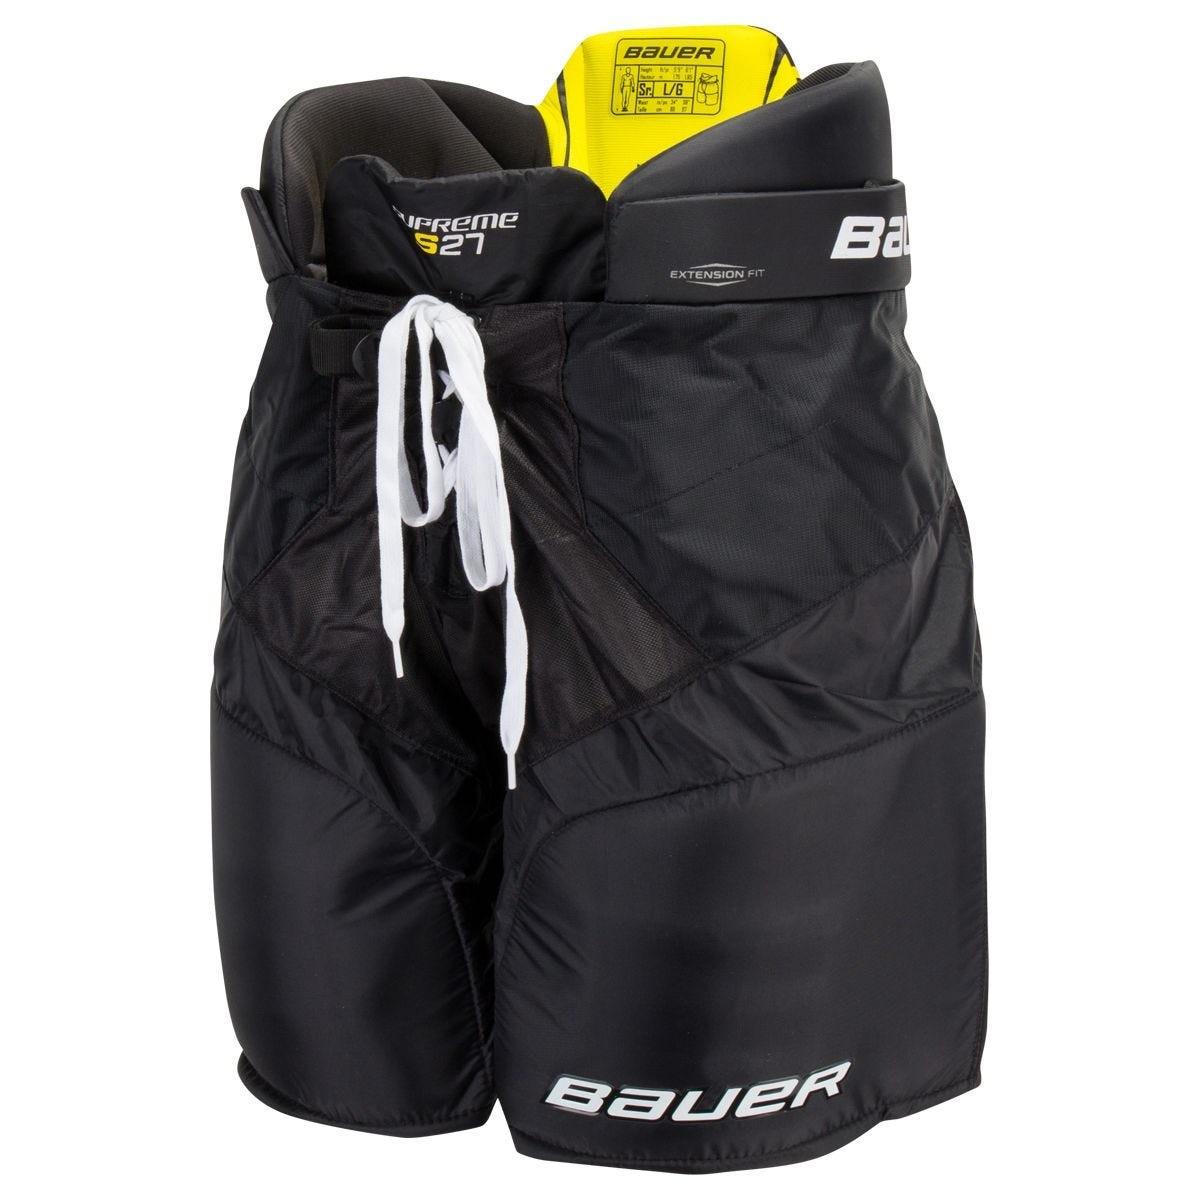 BAUER Supreme S27 S19 Senior Ice Hockey Pants